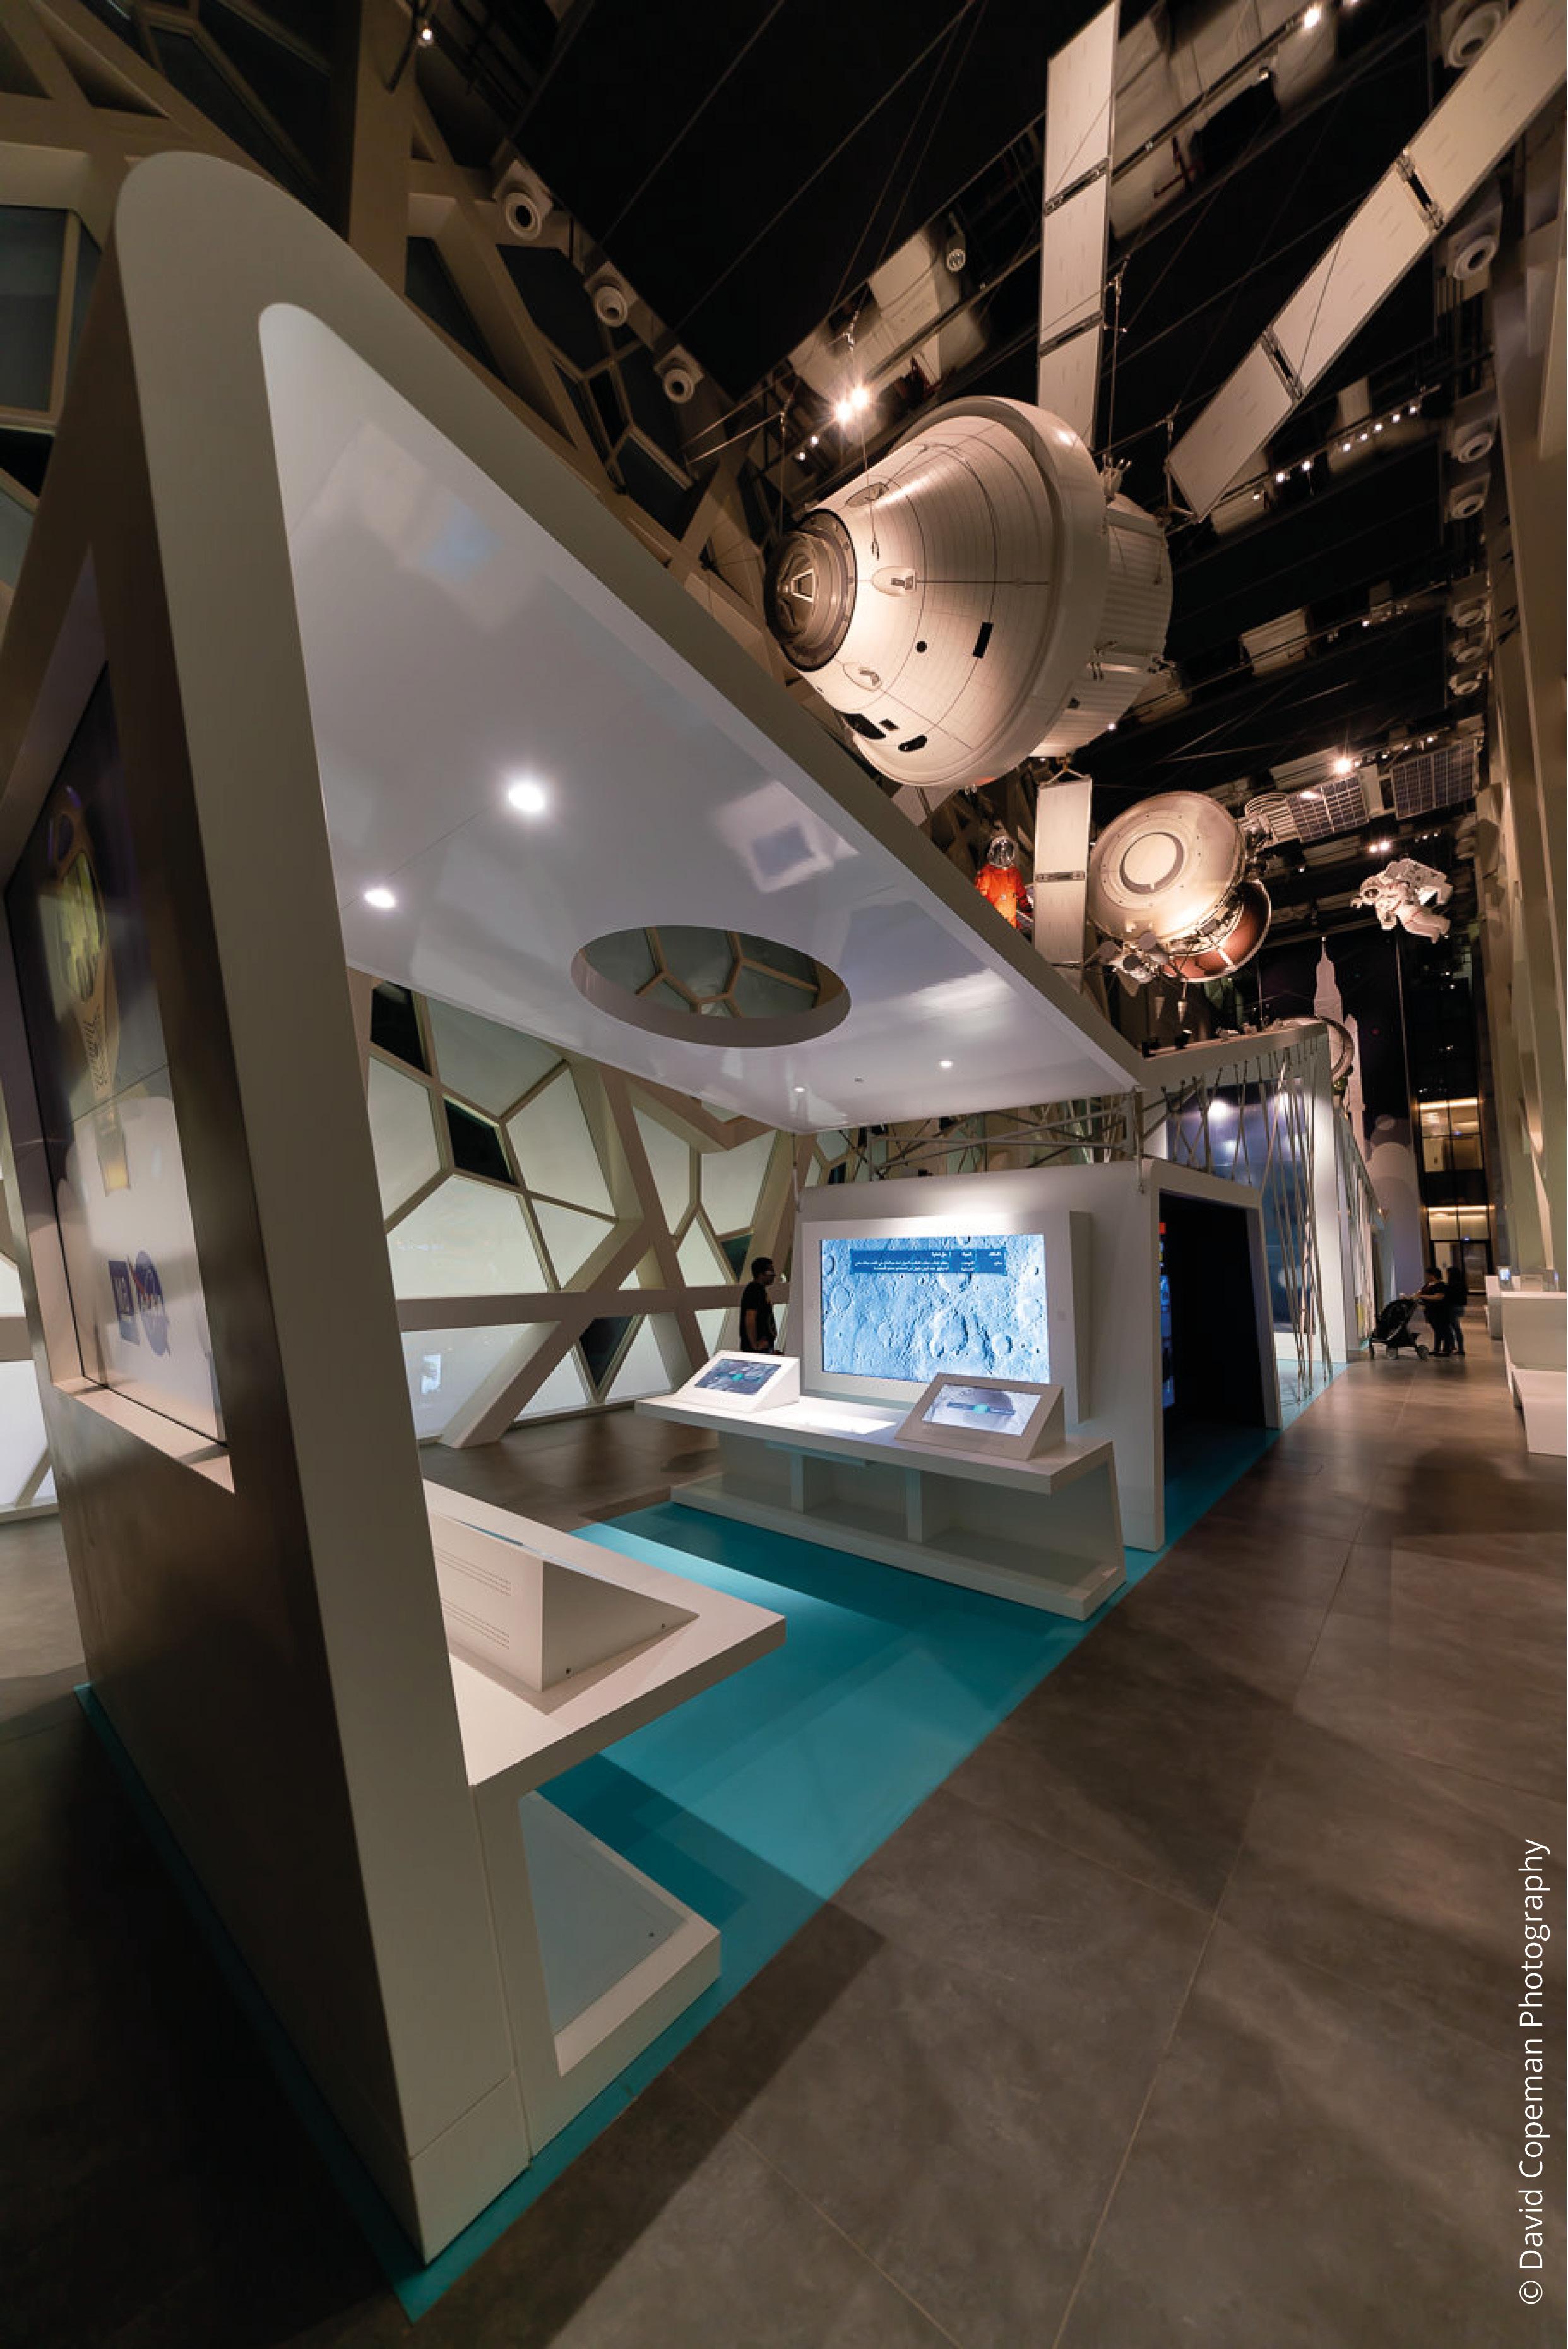 Sheikh Abdullah Al Salem Cultural Centre Space Academy gallery © David Copeman Photography